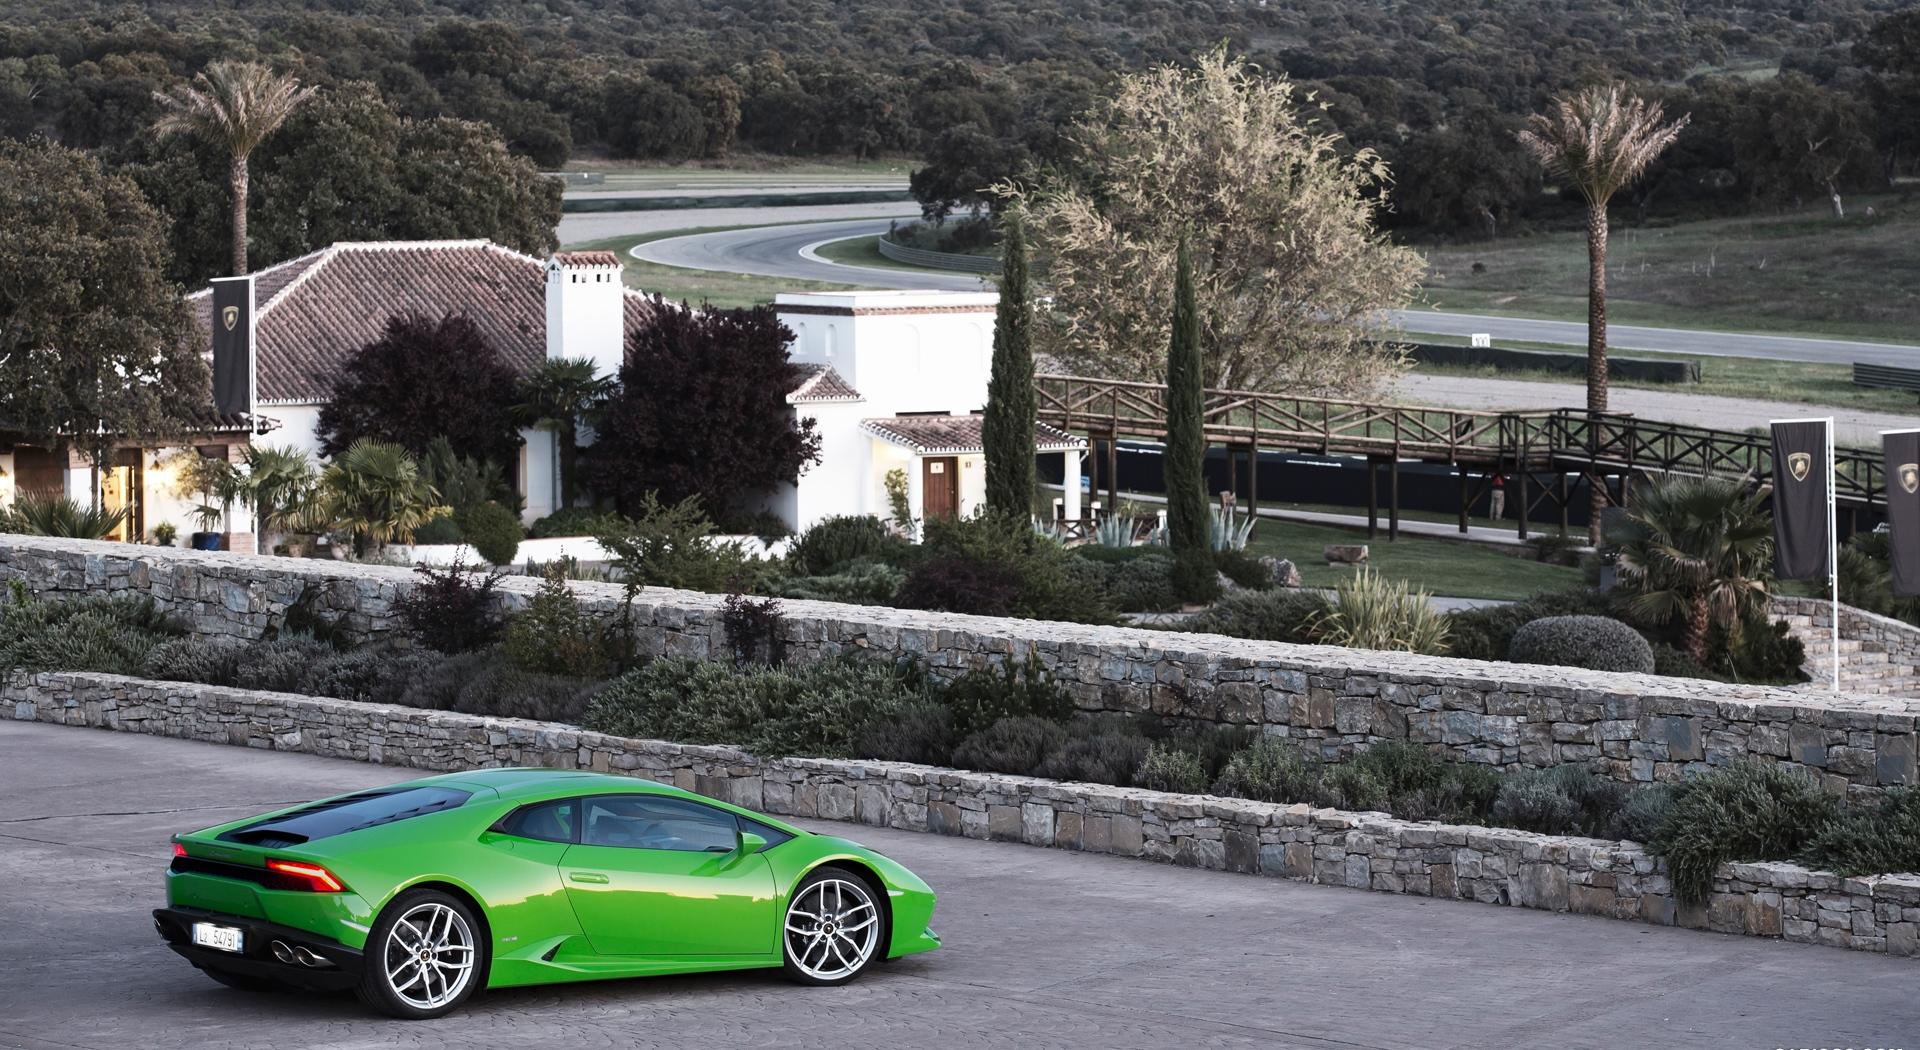 Lamborghini Huracan specification